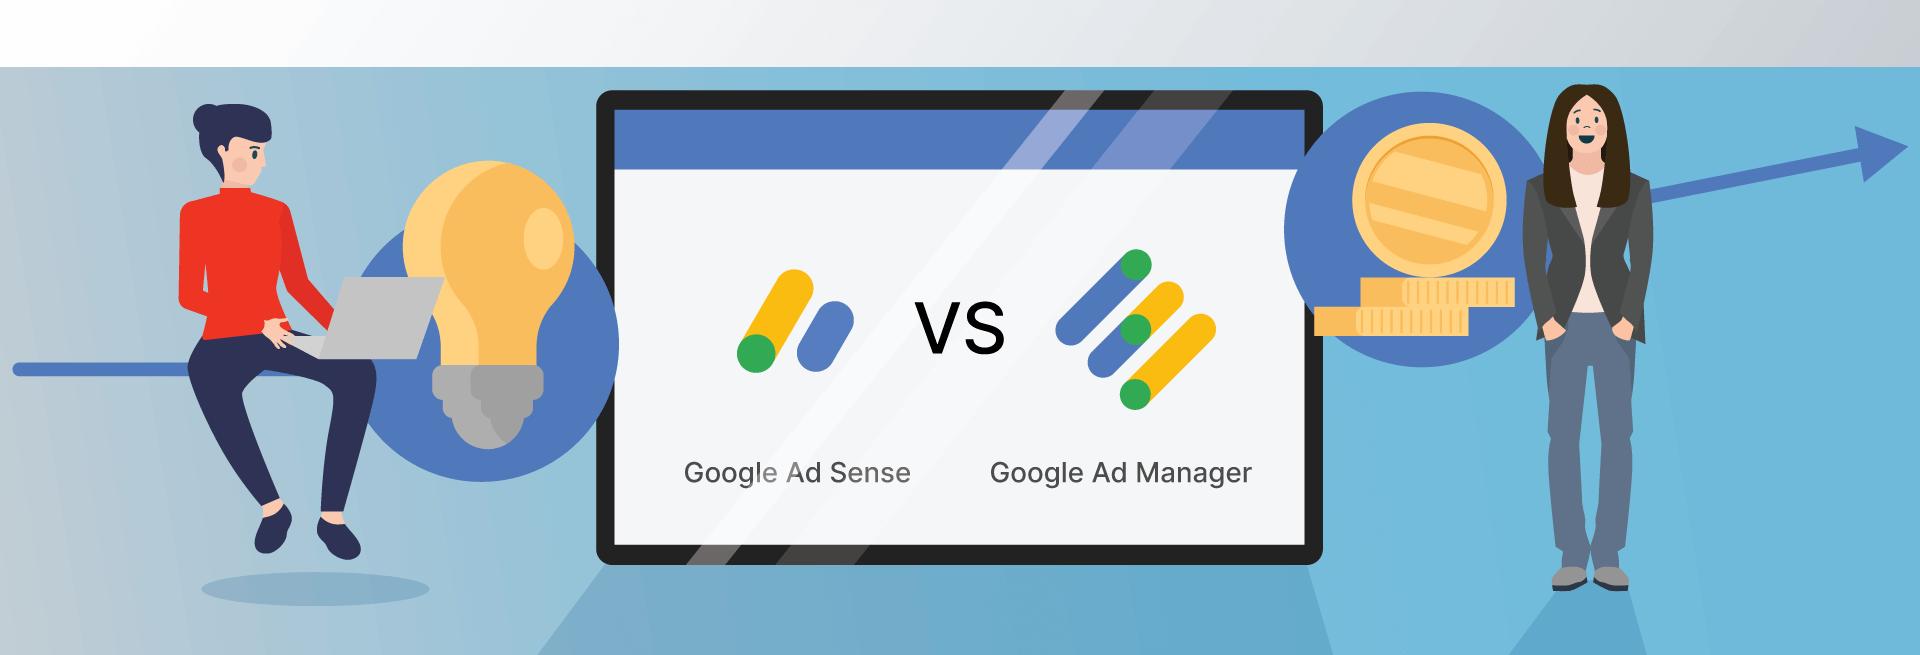 Google-ad-manager-vs-adsense